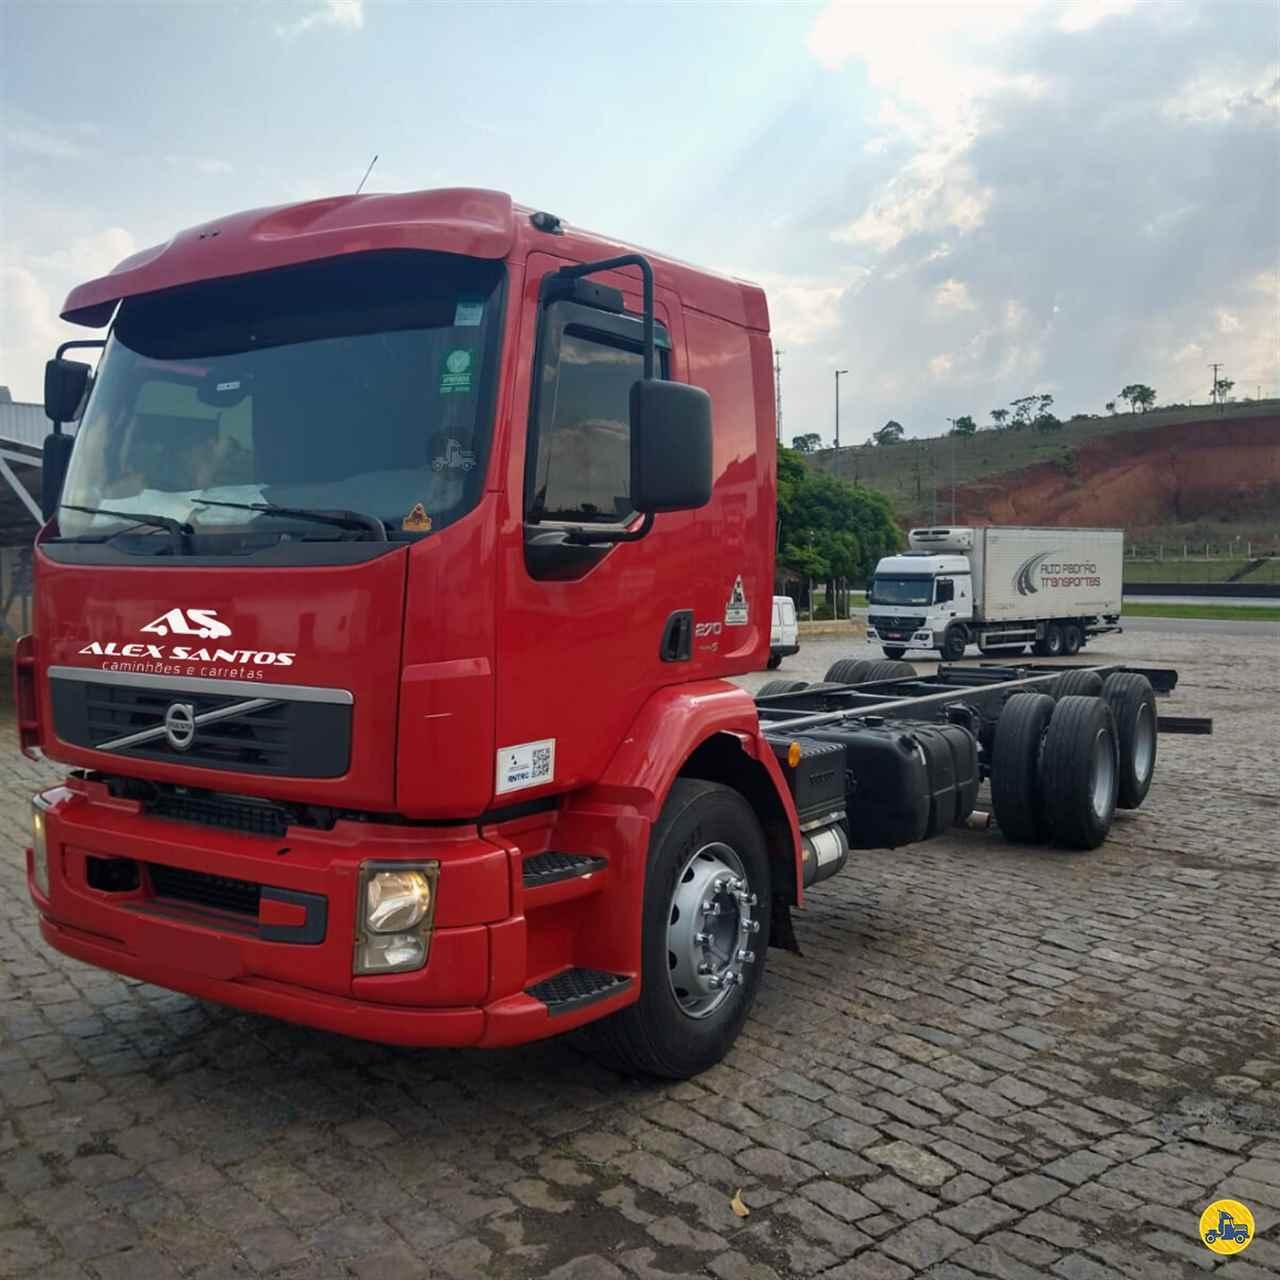 CAMINHAO VOLVO VOLVO VM 270 Cavalo Mecânico Truck 6x2 Alex Santos Caminhões - Pouso Alegre POUSO ALEGRE MINAS GERAIS MG